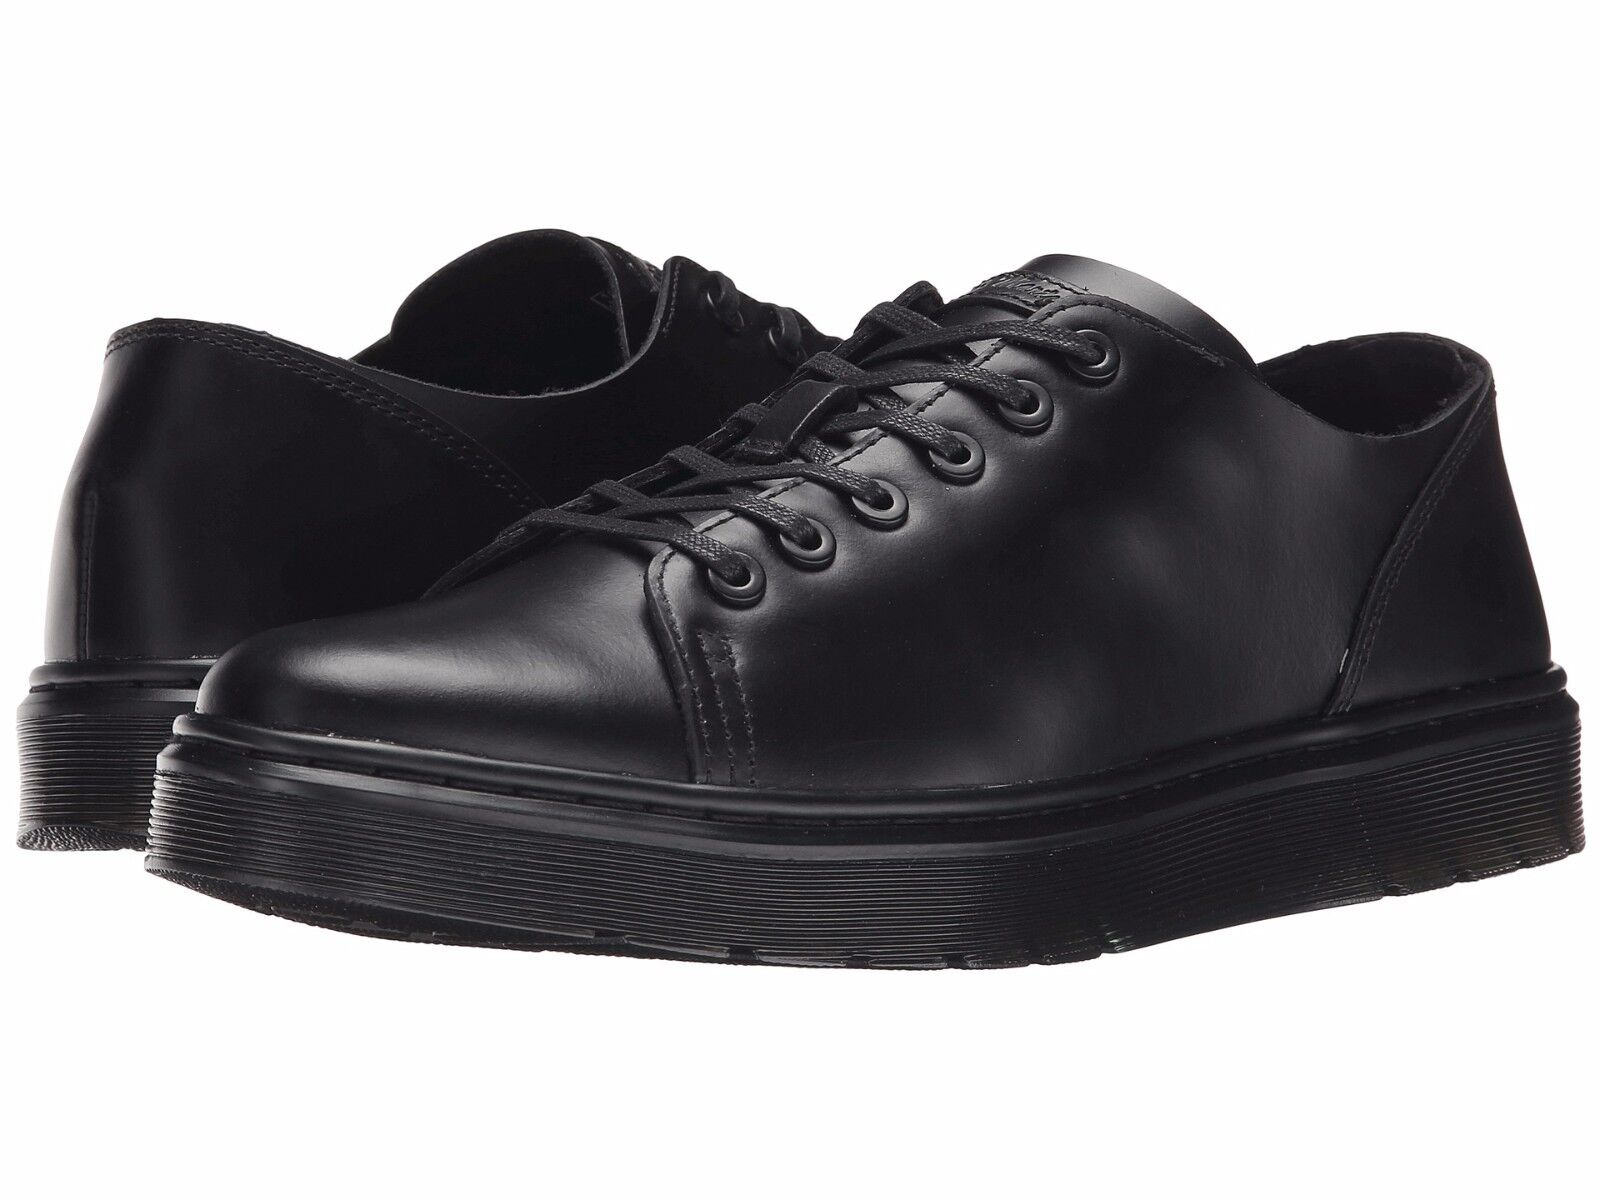 Men\s Shoes Dr Martens Dante 6 Eye Lace Up Leather Oxford 16736001 Black *New*